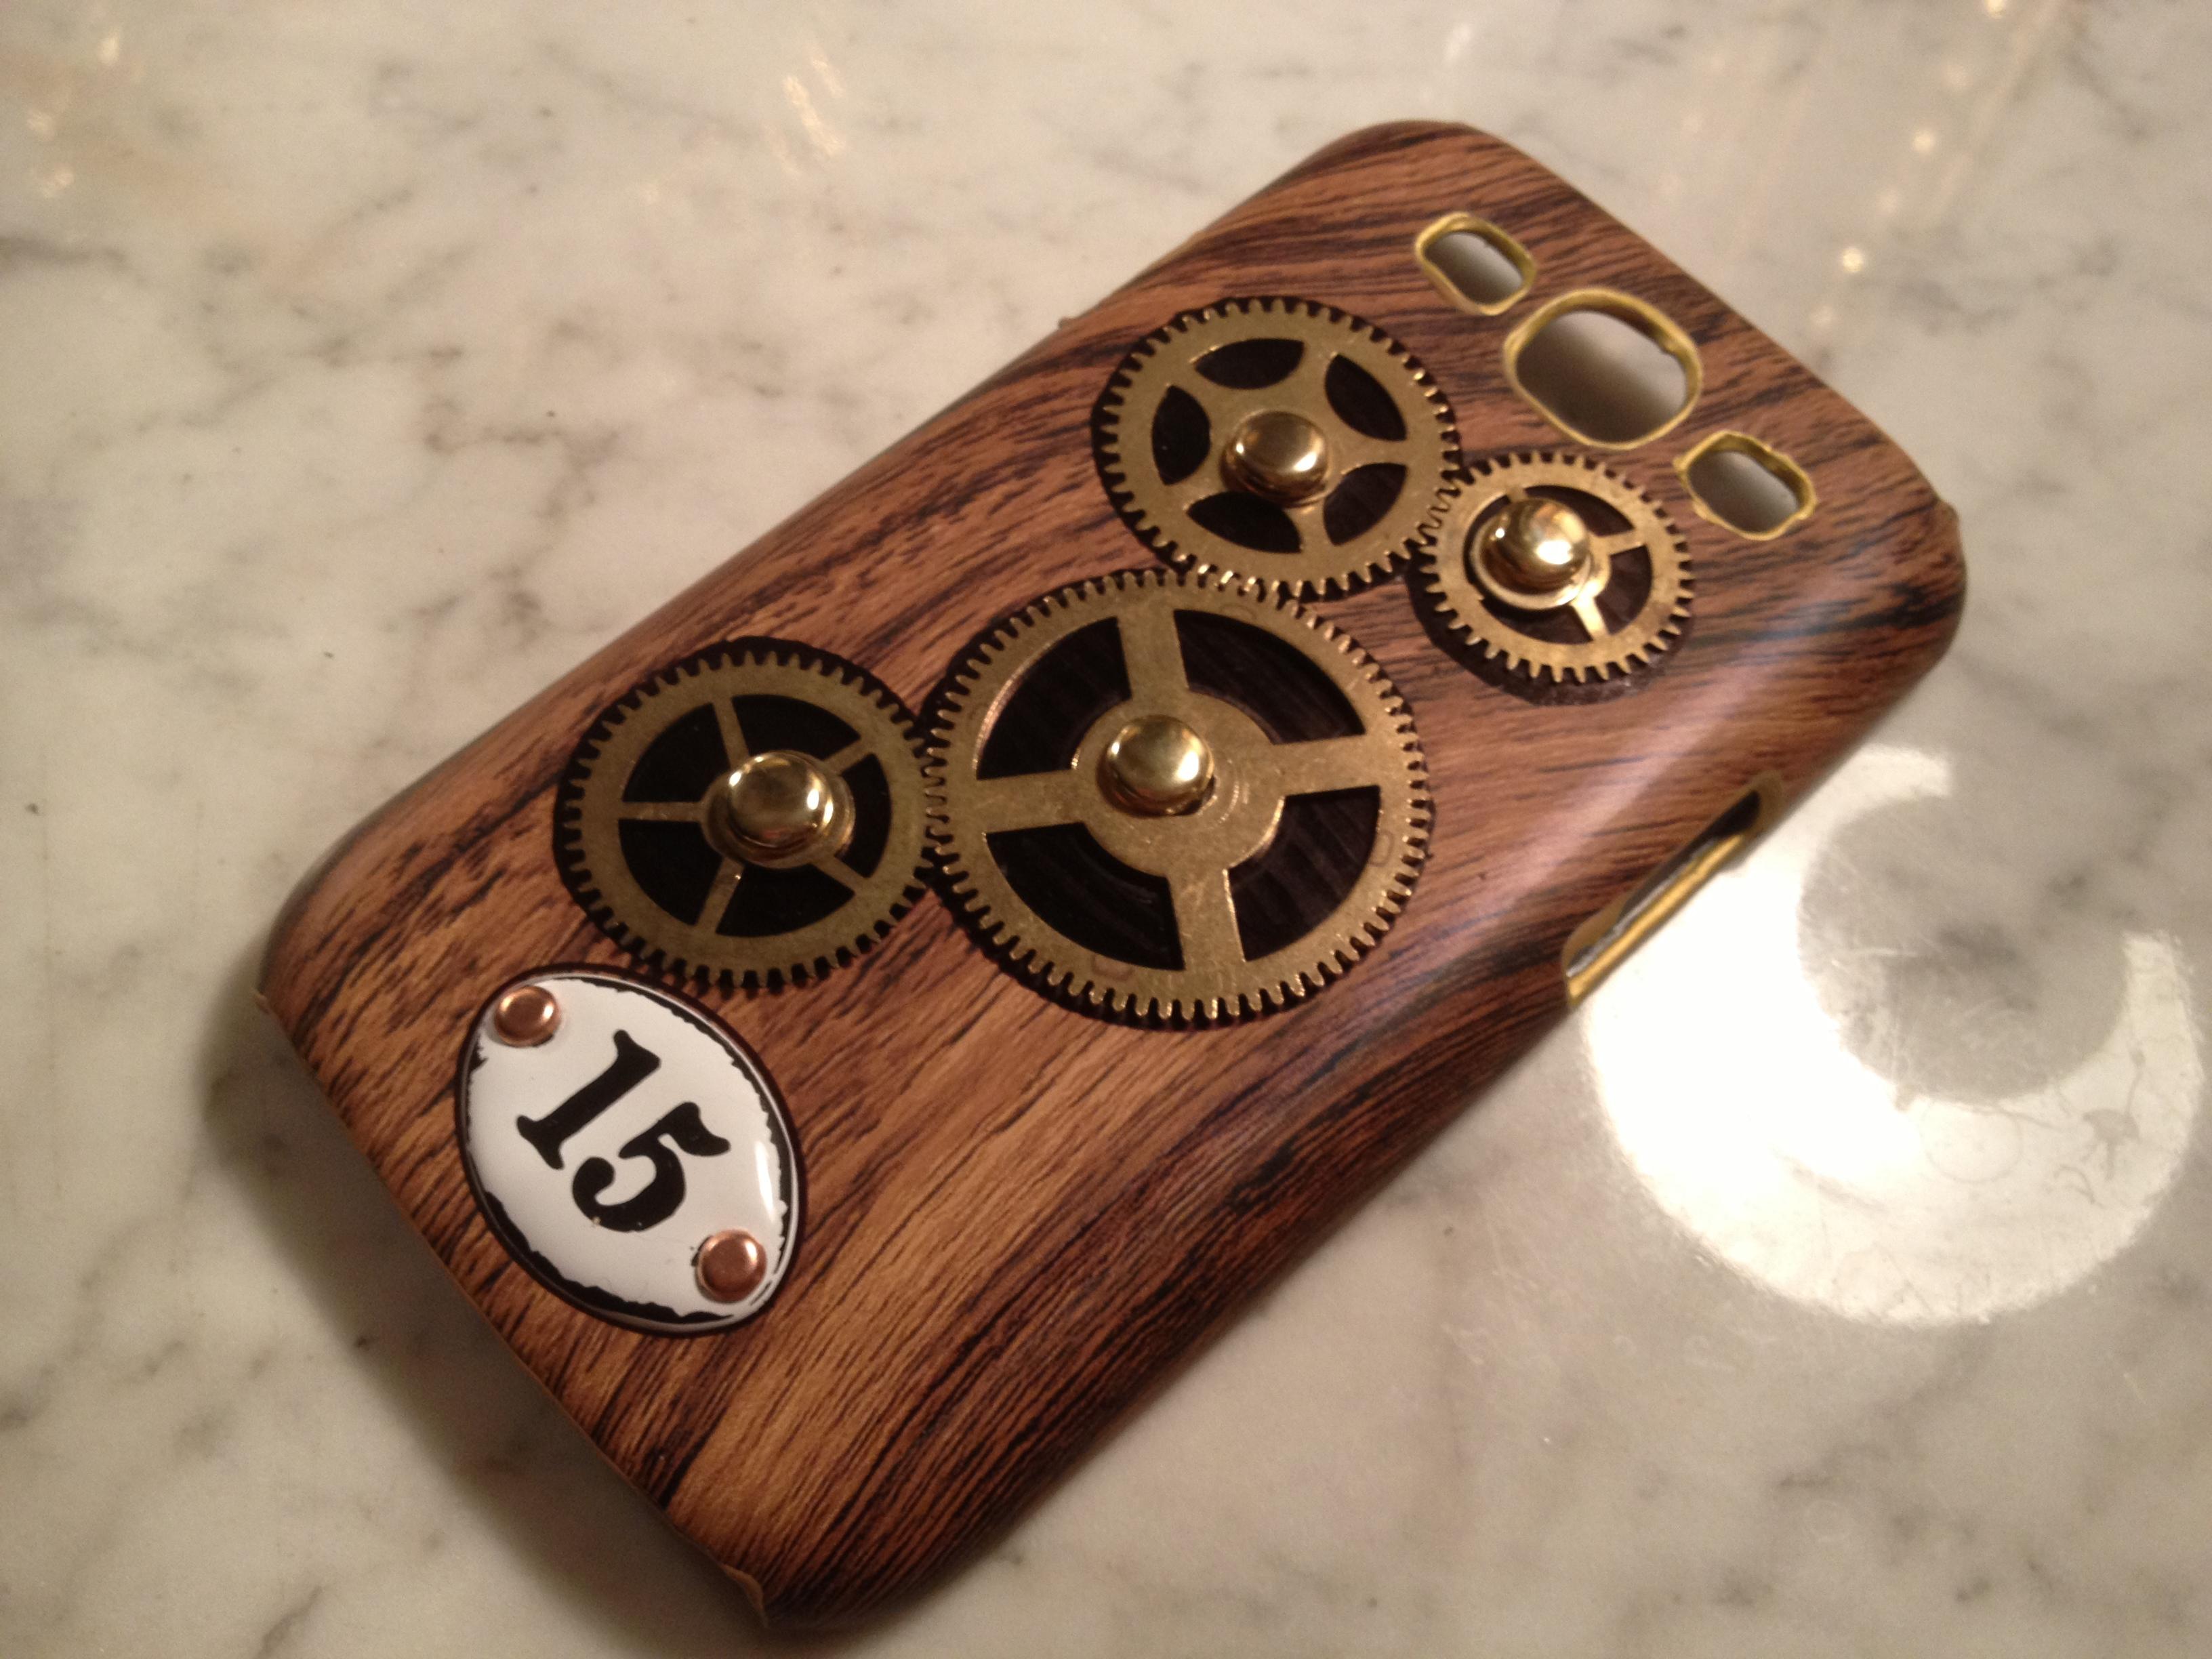 i_gearz_samsung_galaxy_s3_steampunk_phone_case_gear_spin_phone_cases_6.jpg